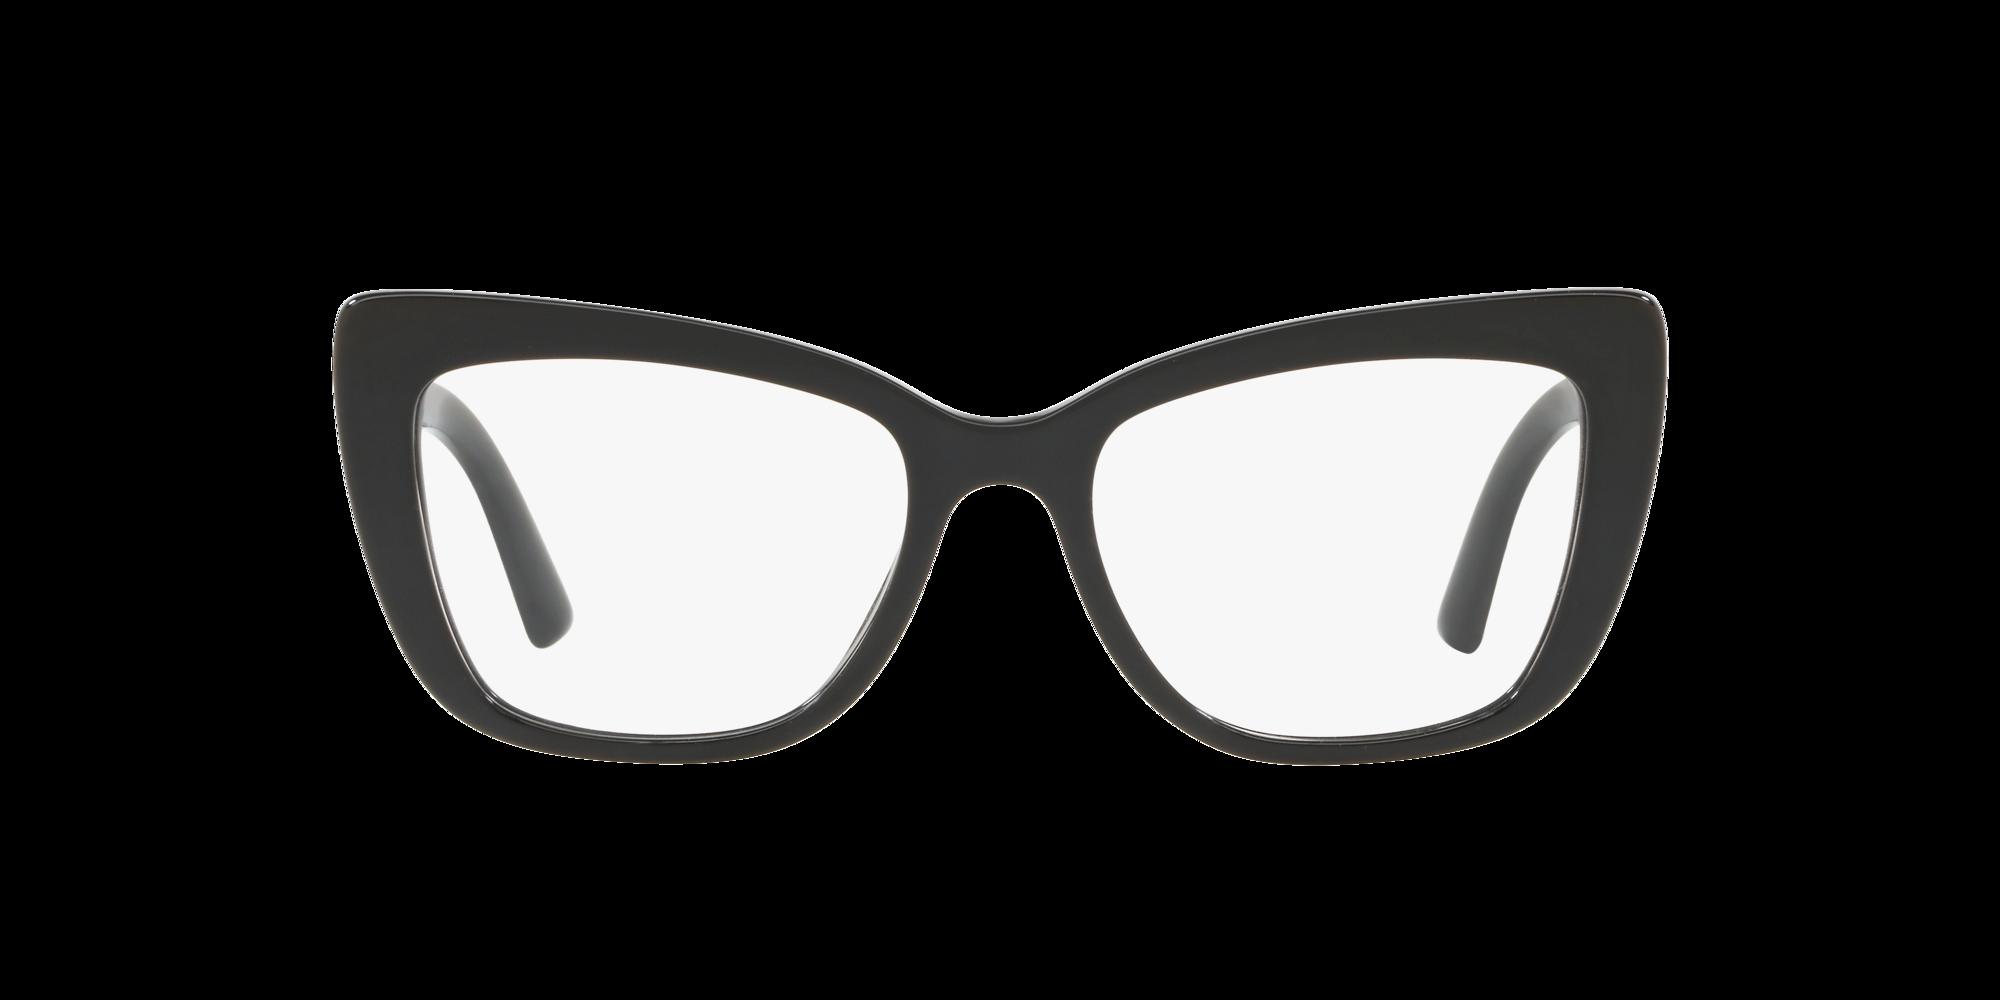 Image for DG3308 from LensCrafters | Glasses, Prescription Glasses Online, Eyewear